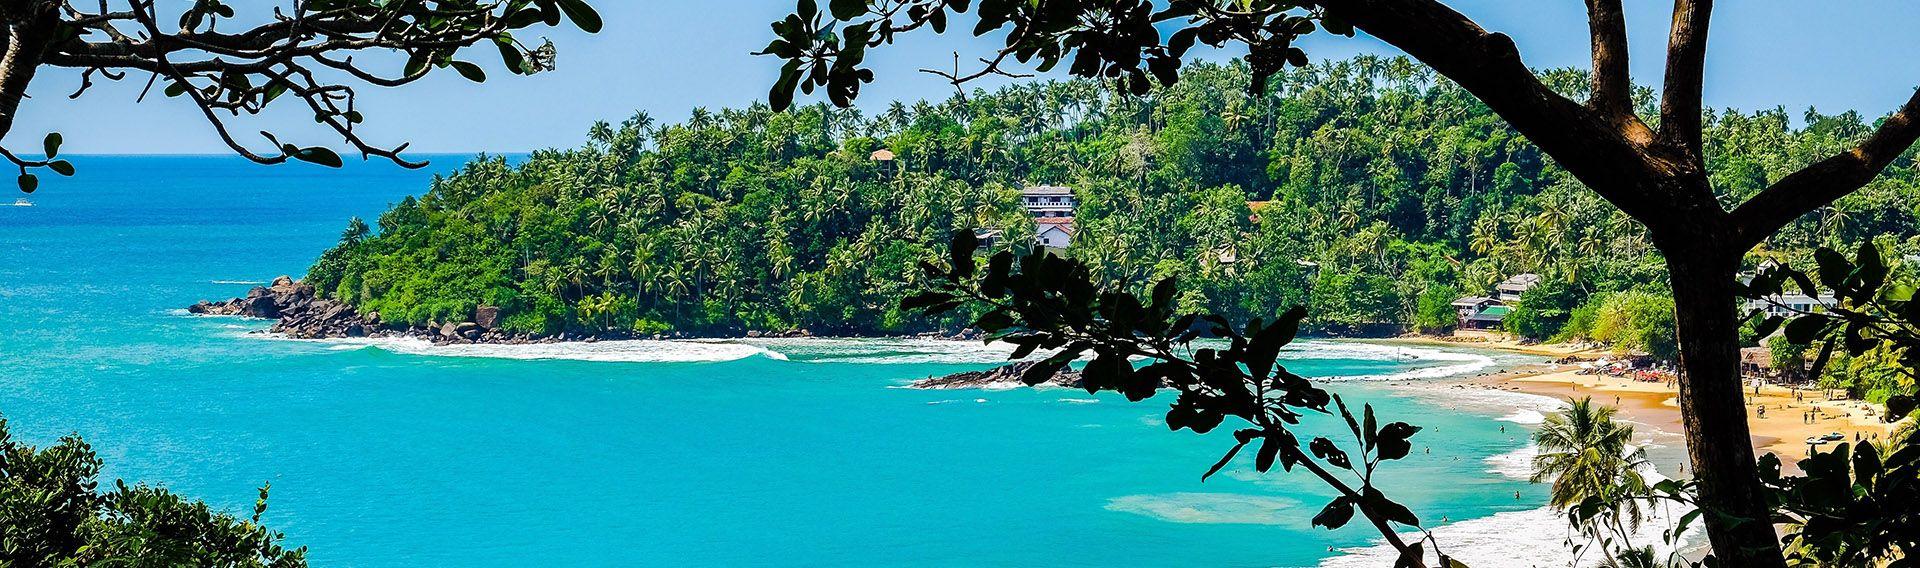 Baie de Mirissa, côte Surd, Sri Lanka